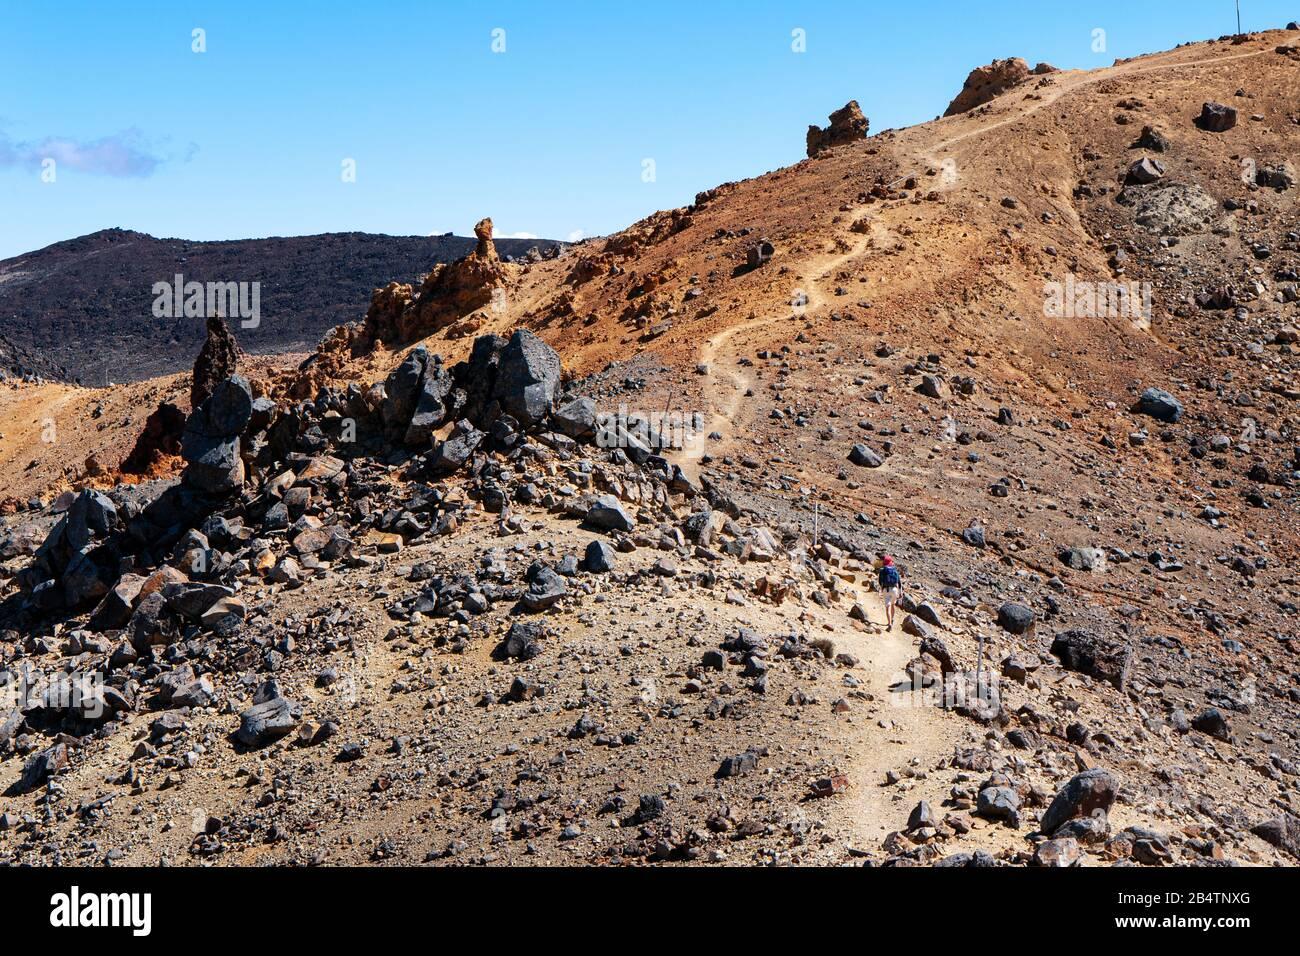 Volcanic rocks on the slopes of Mount Tongariro, Tongariro Alpine Crossing, New Zealand Stock Photo